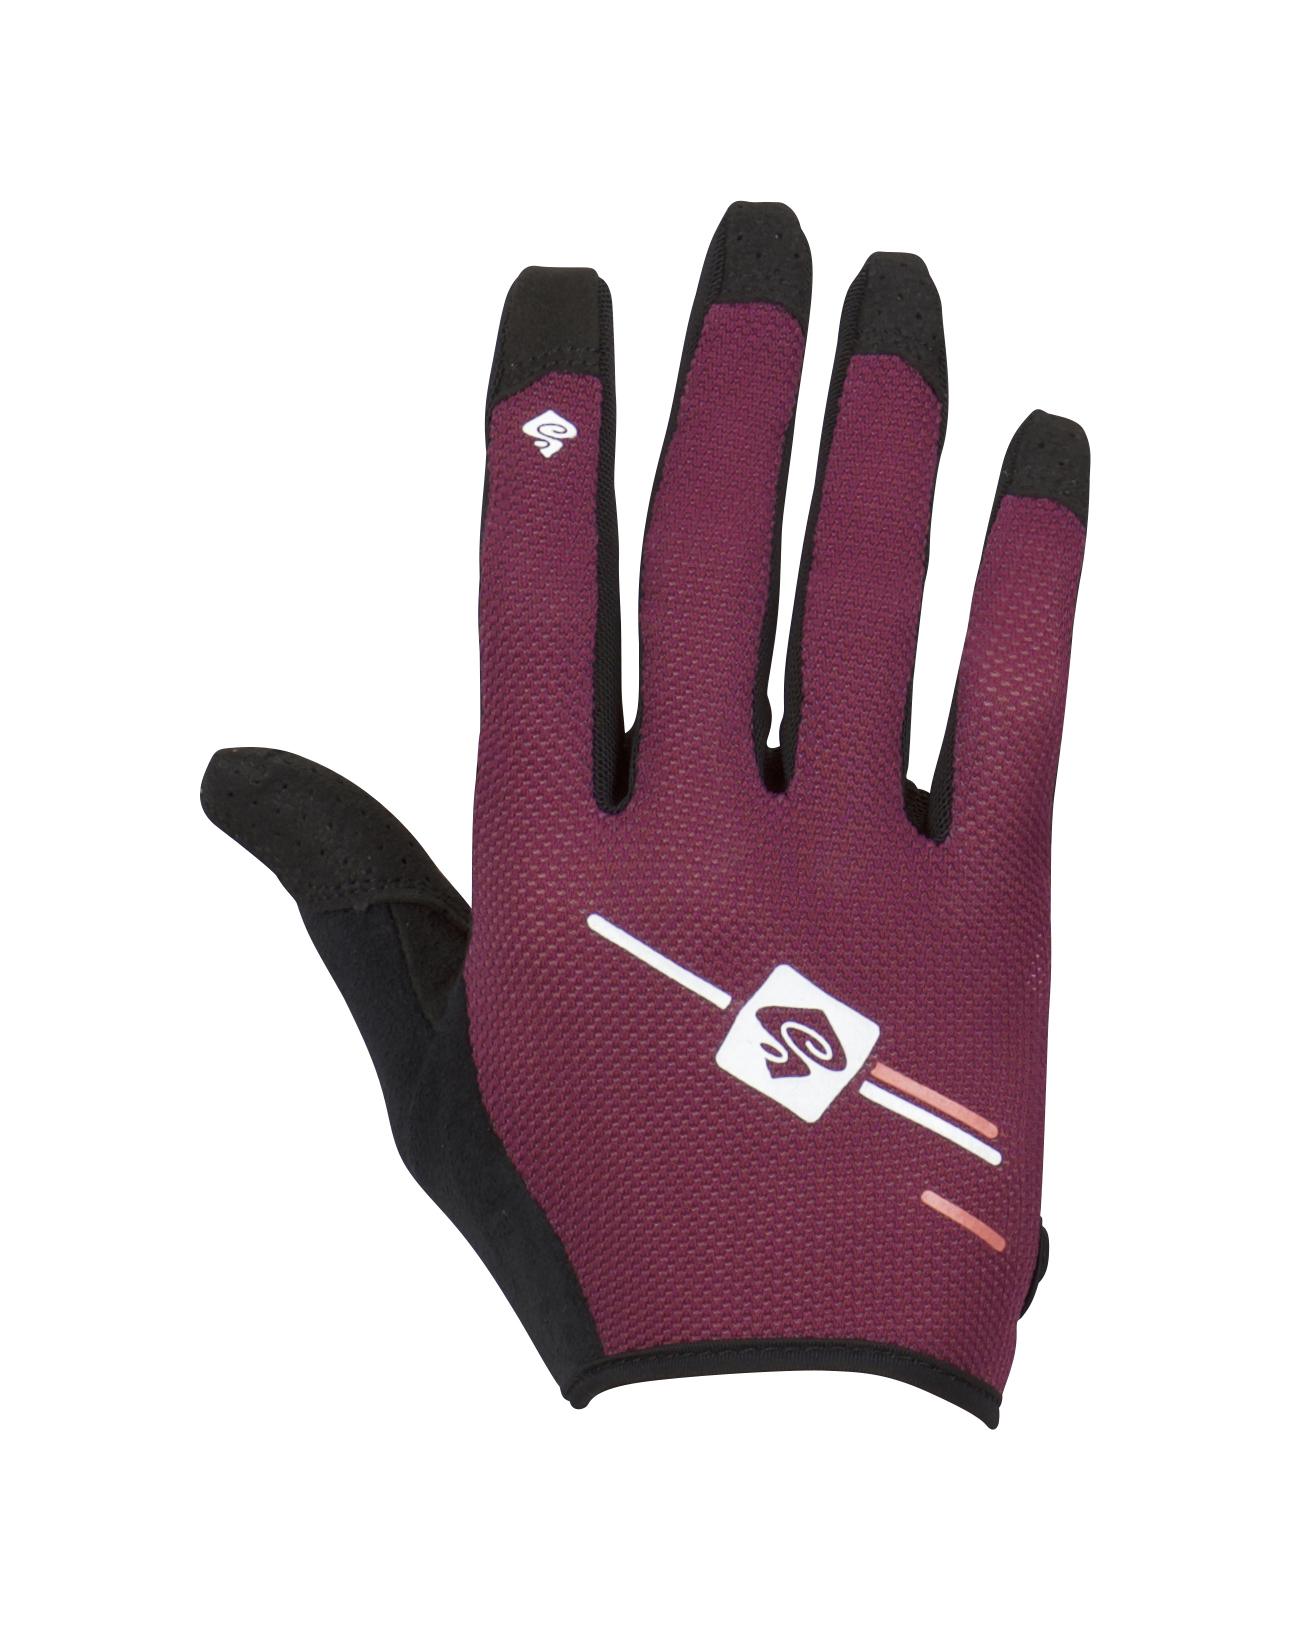 828055-hunter_light_gloves_wmns-vibrant_violet-front.jpg